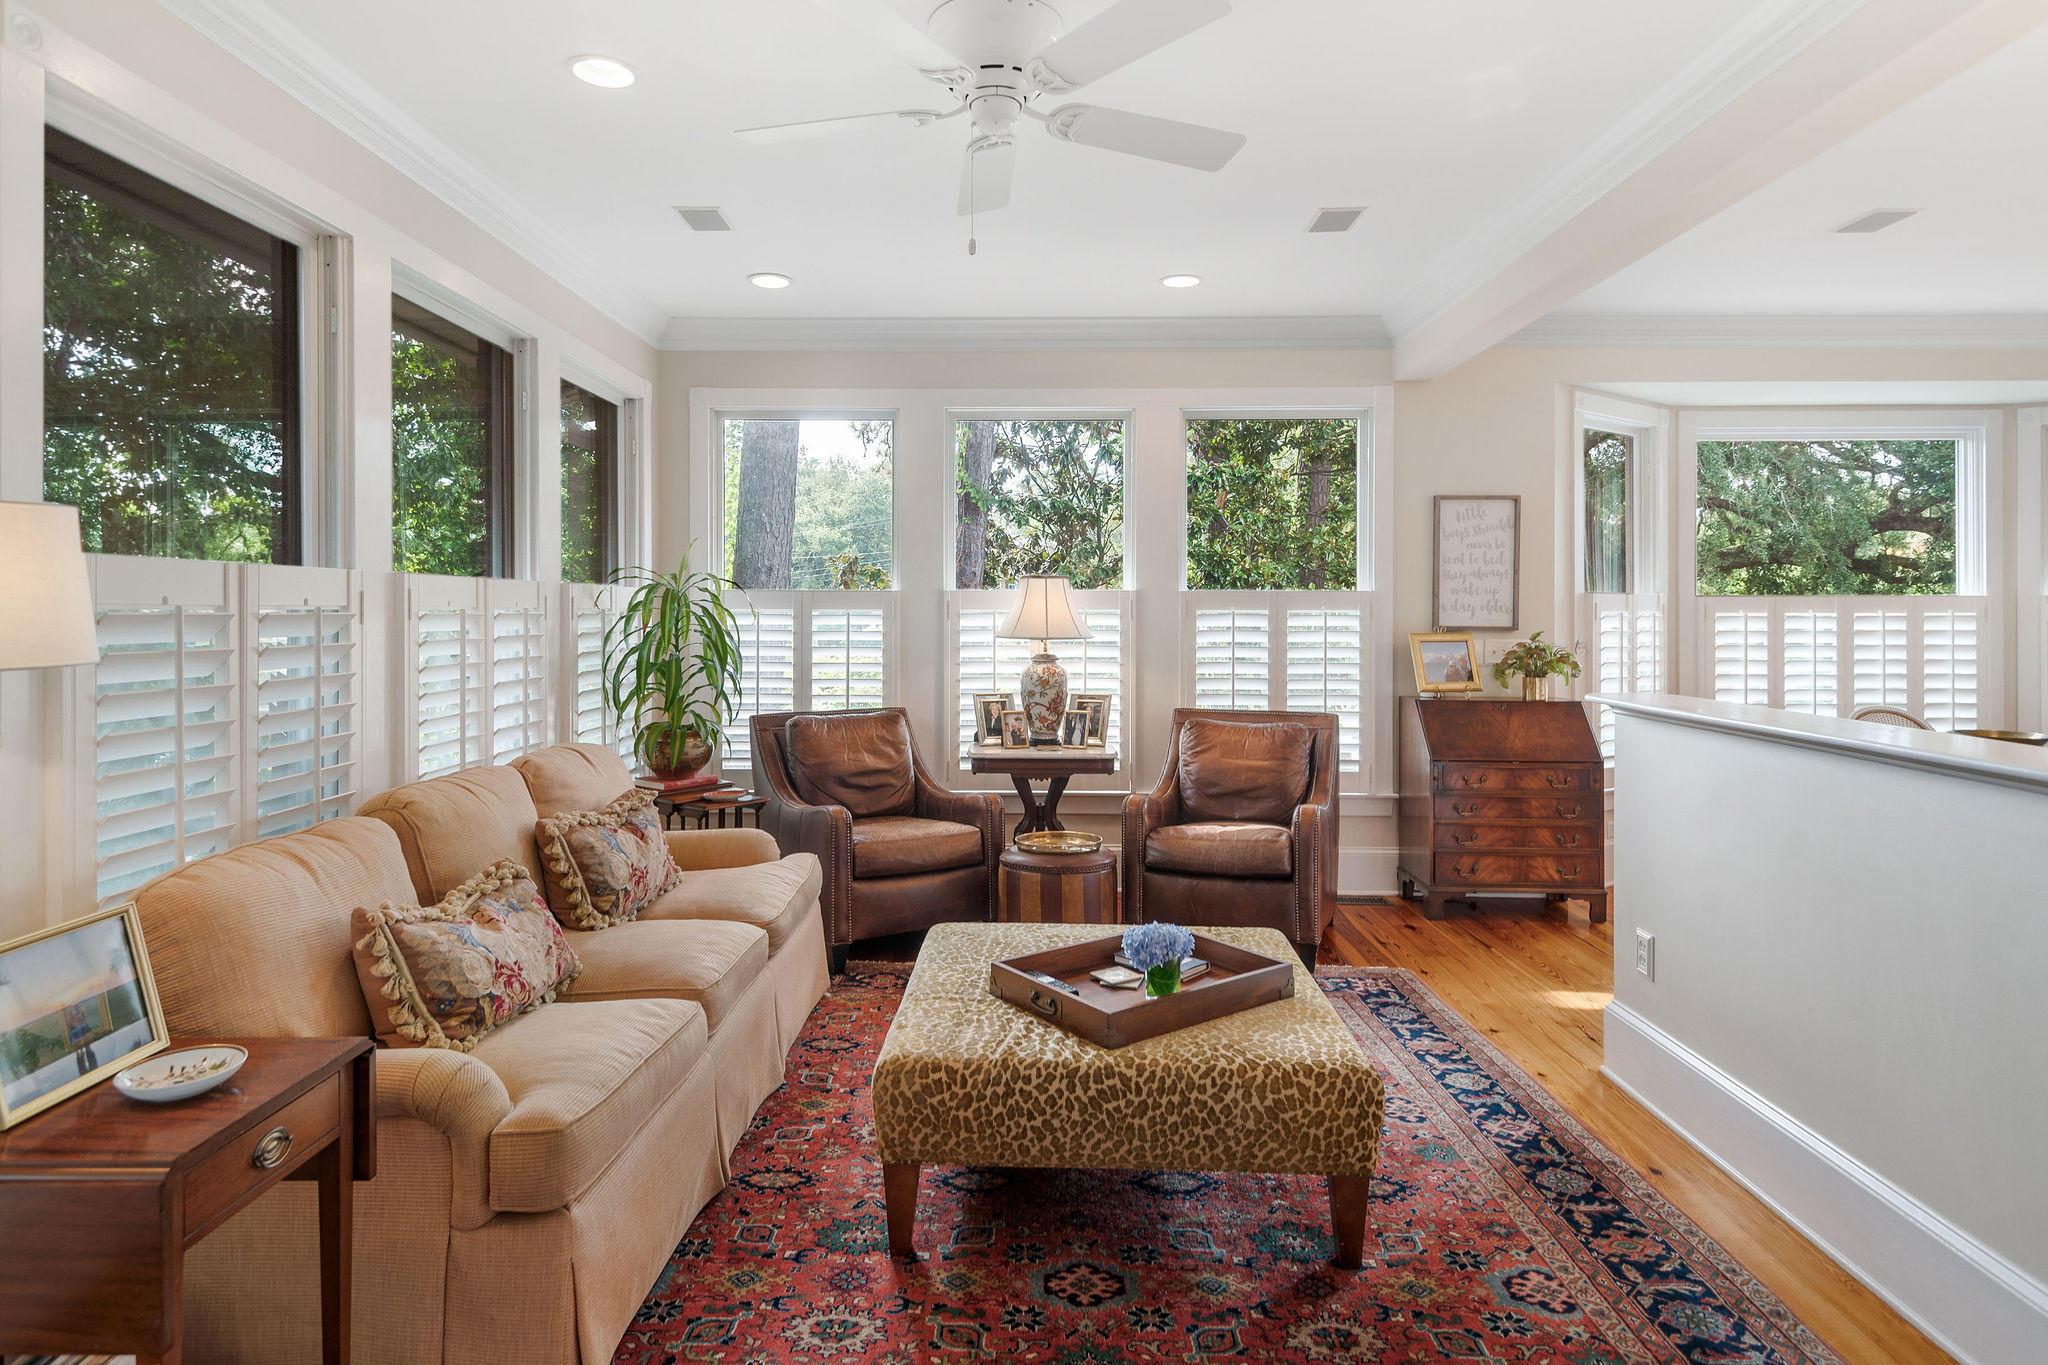 Country Club II Homes For Sale - 1482 Burningtree, Charleston, SC - 45